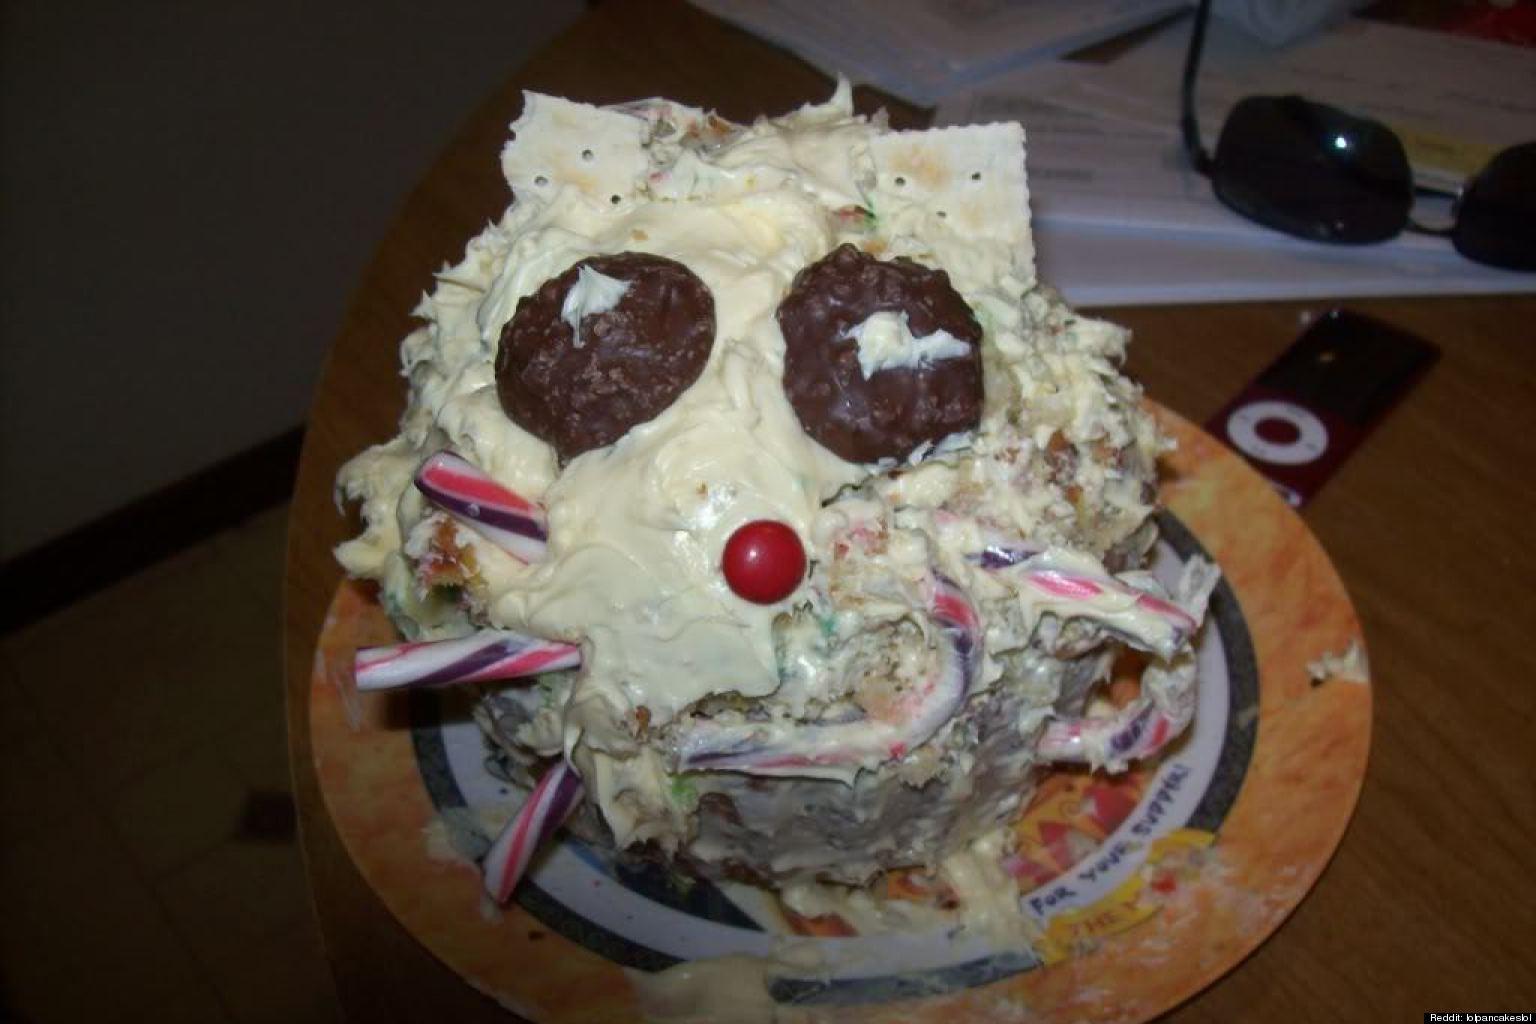 Comida cuqui fail: El tópic de los horrores fotogénicos culinarios - Página 4 O-cake-fails-baking-mistakes-facebook